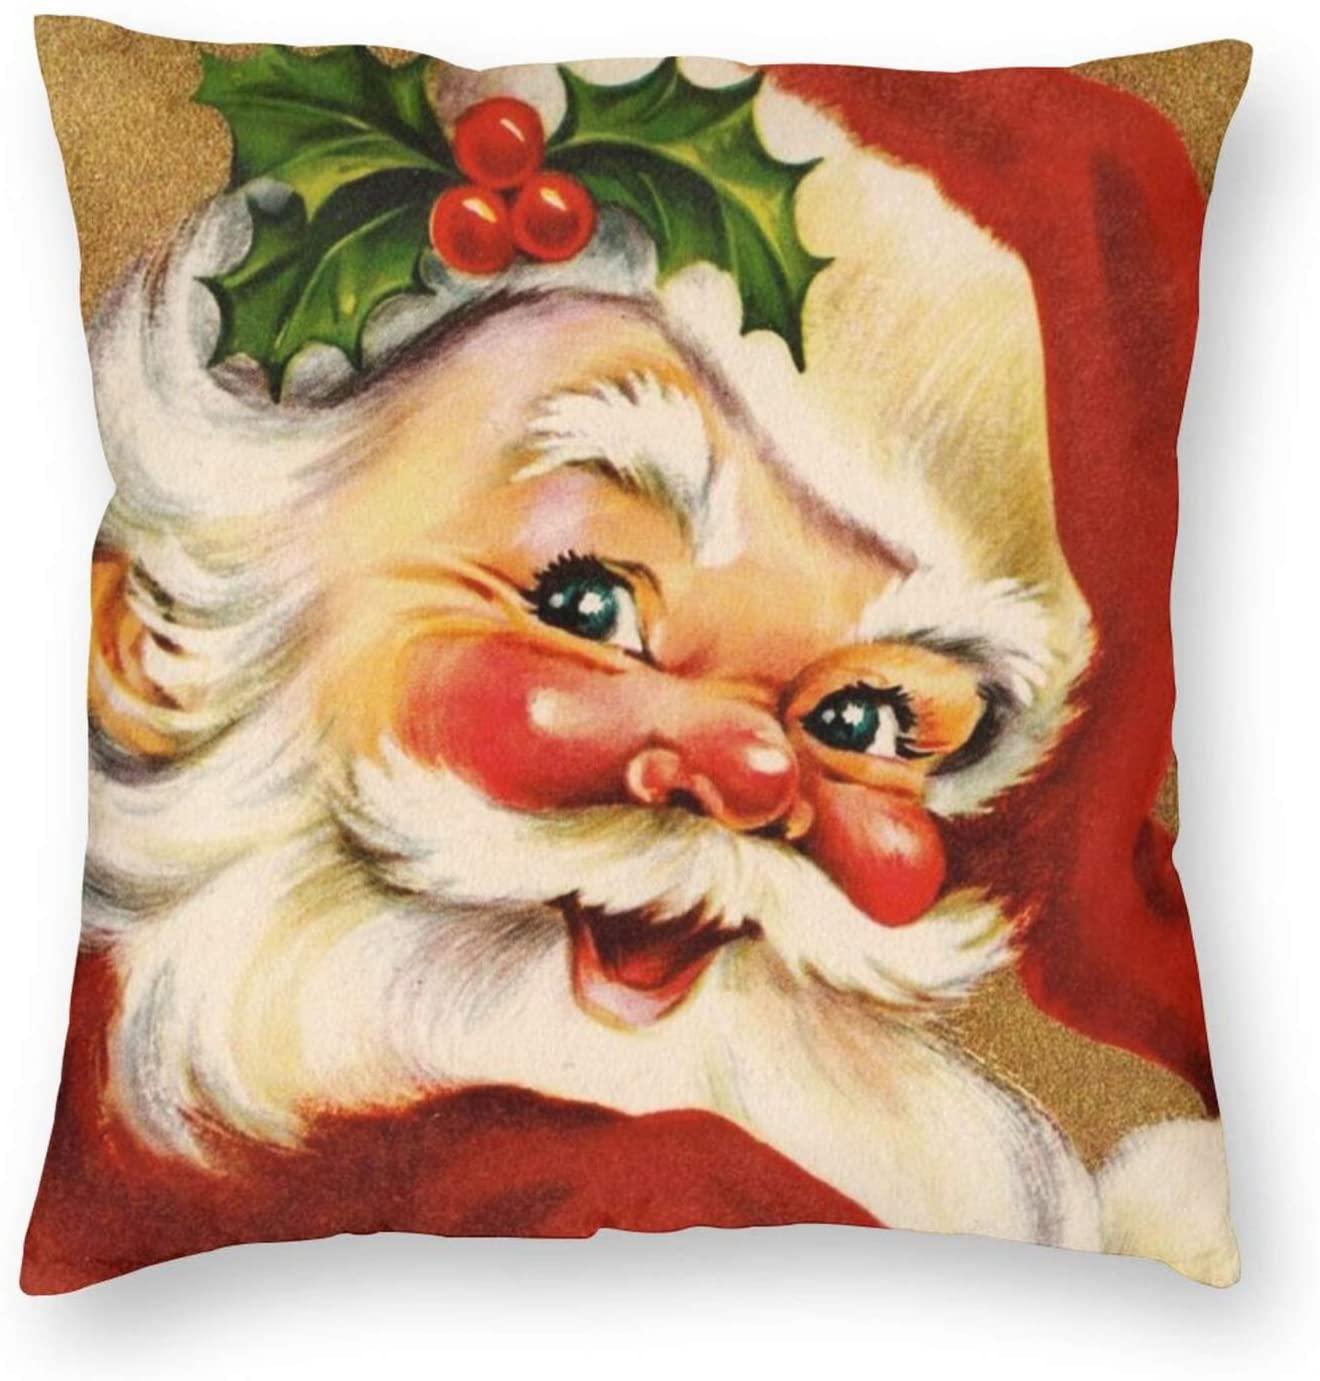 Christmas Decorations Christmas Pillow Covers Santa Throw Pillow Cushion Cover Case Square Pillowcase